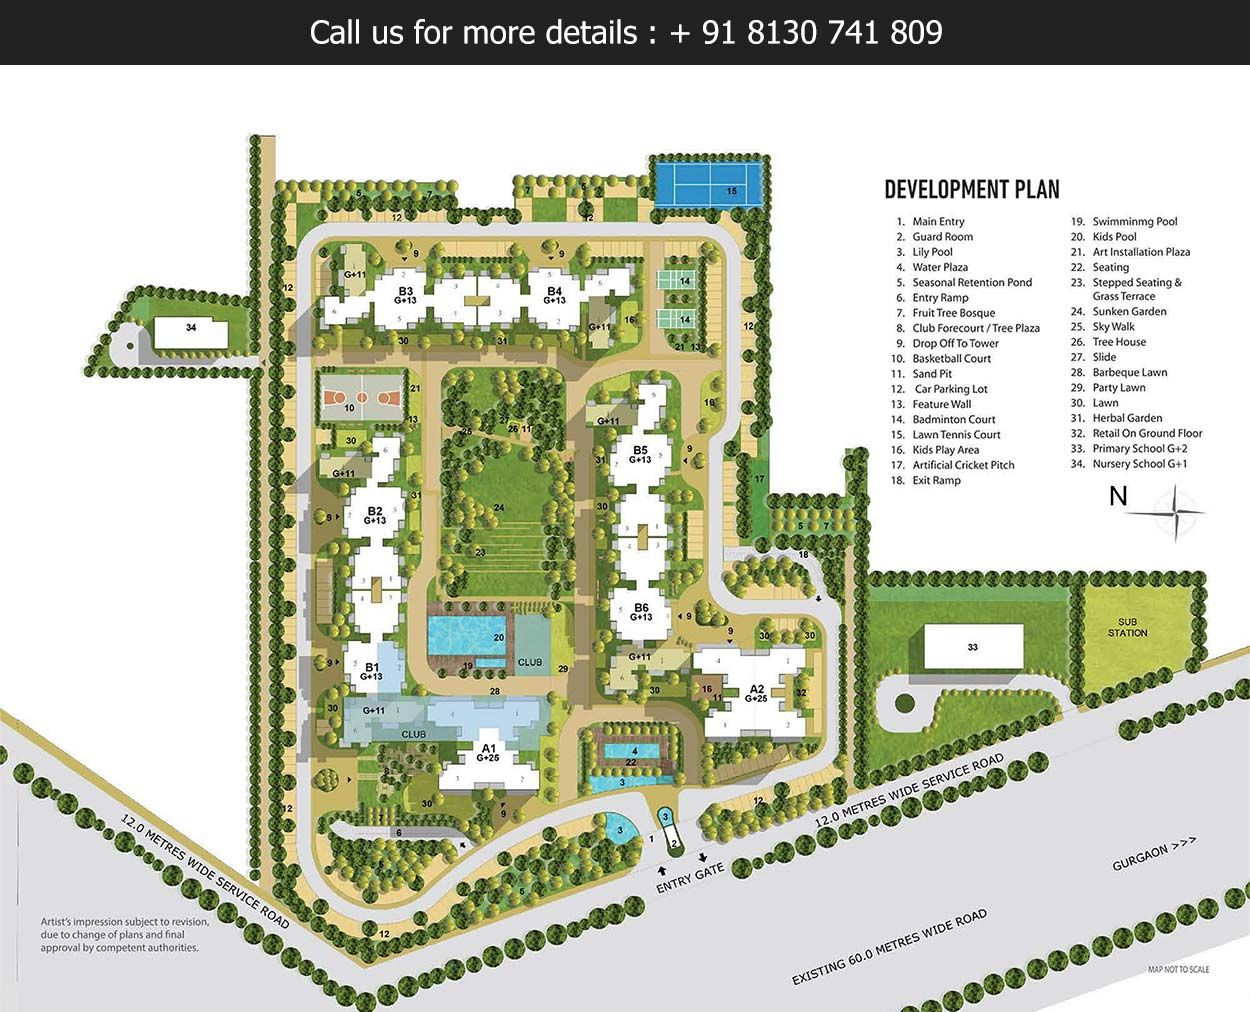 TATA La VIDA Master Plan - a 12 acres residential development ...